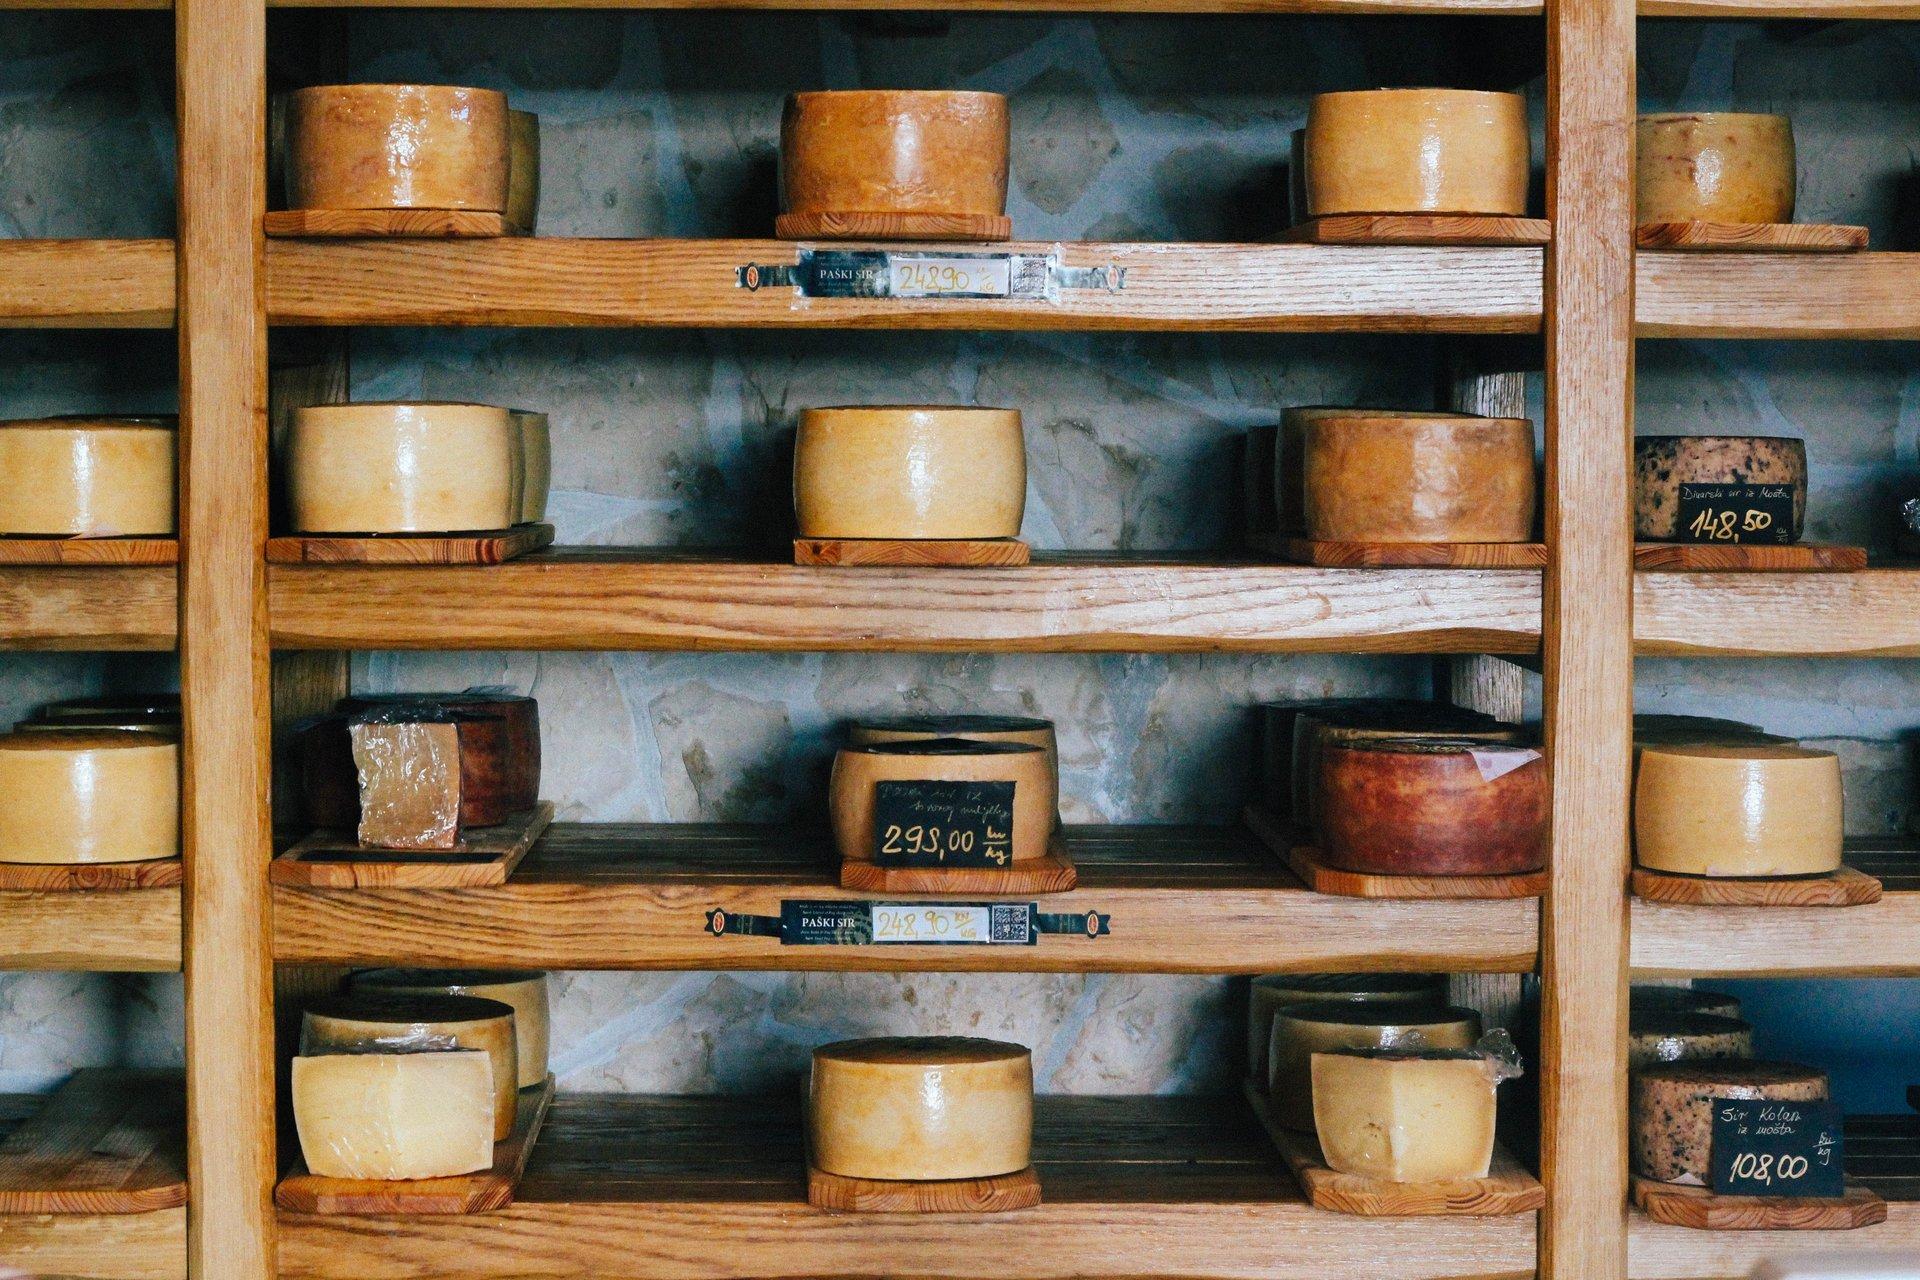 Pag Cheese Season in Croatia 2019 - Best Time